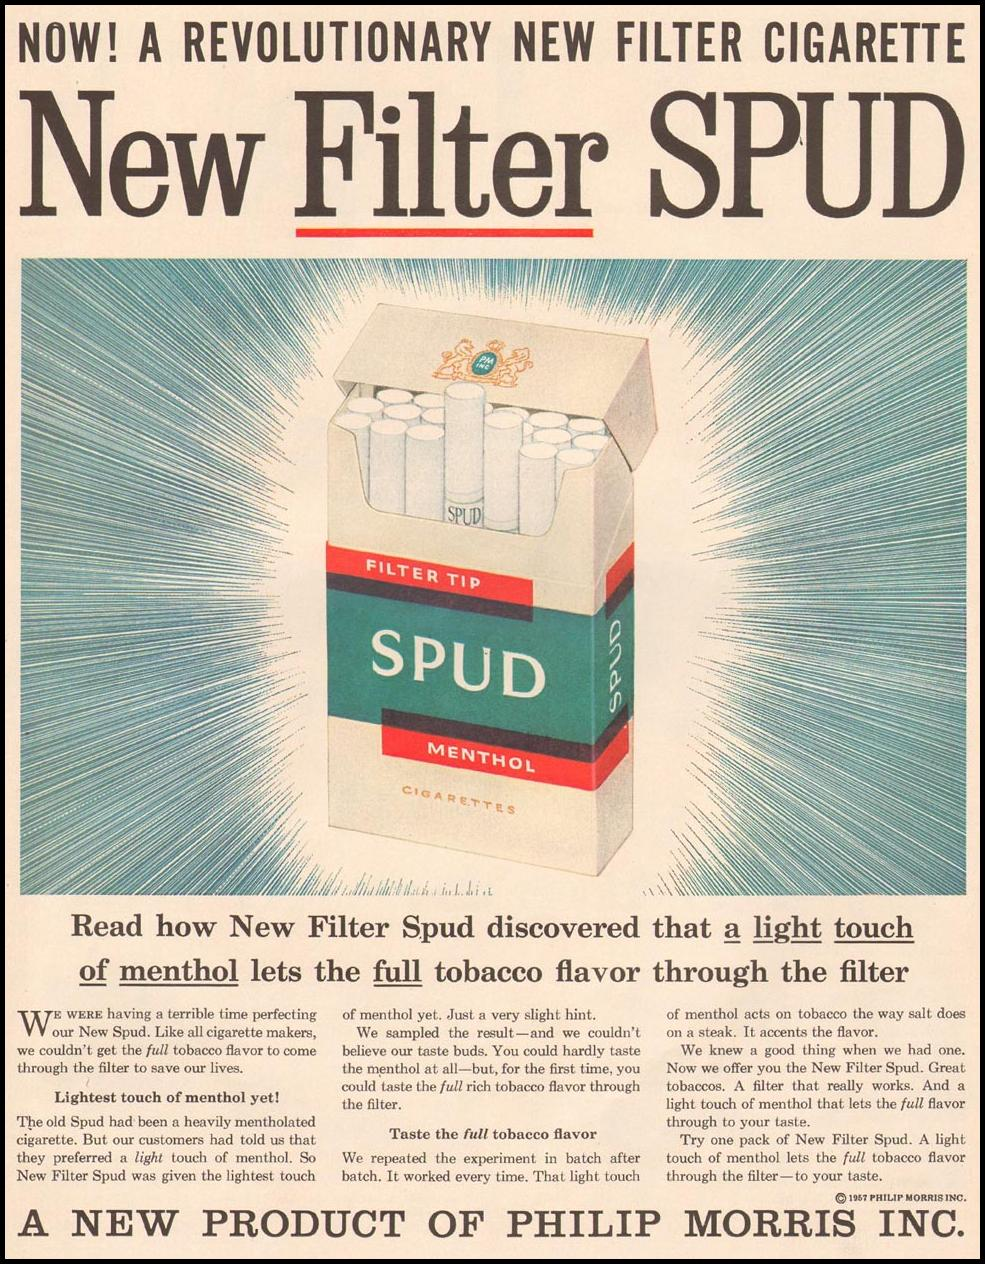 SPUD CIGARETTES LIFE 04/01/1957 p. 99